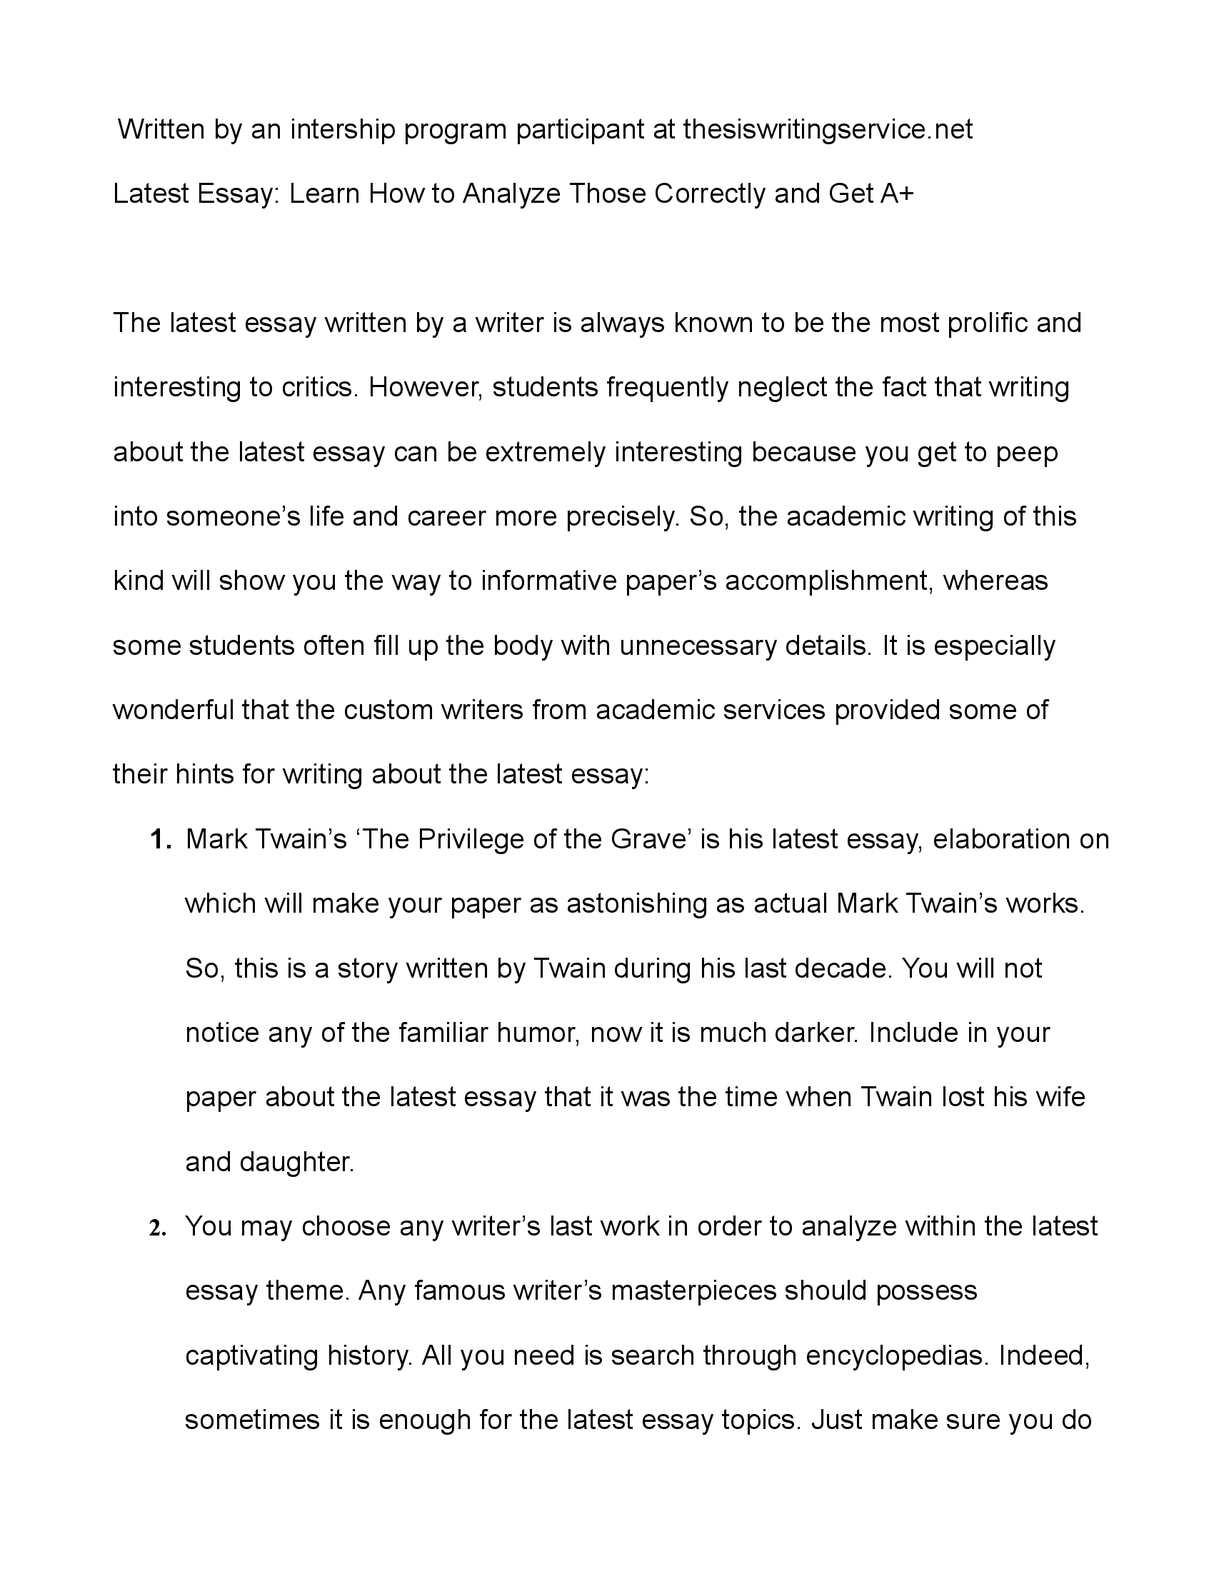 what is man twain essay